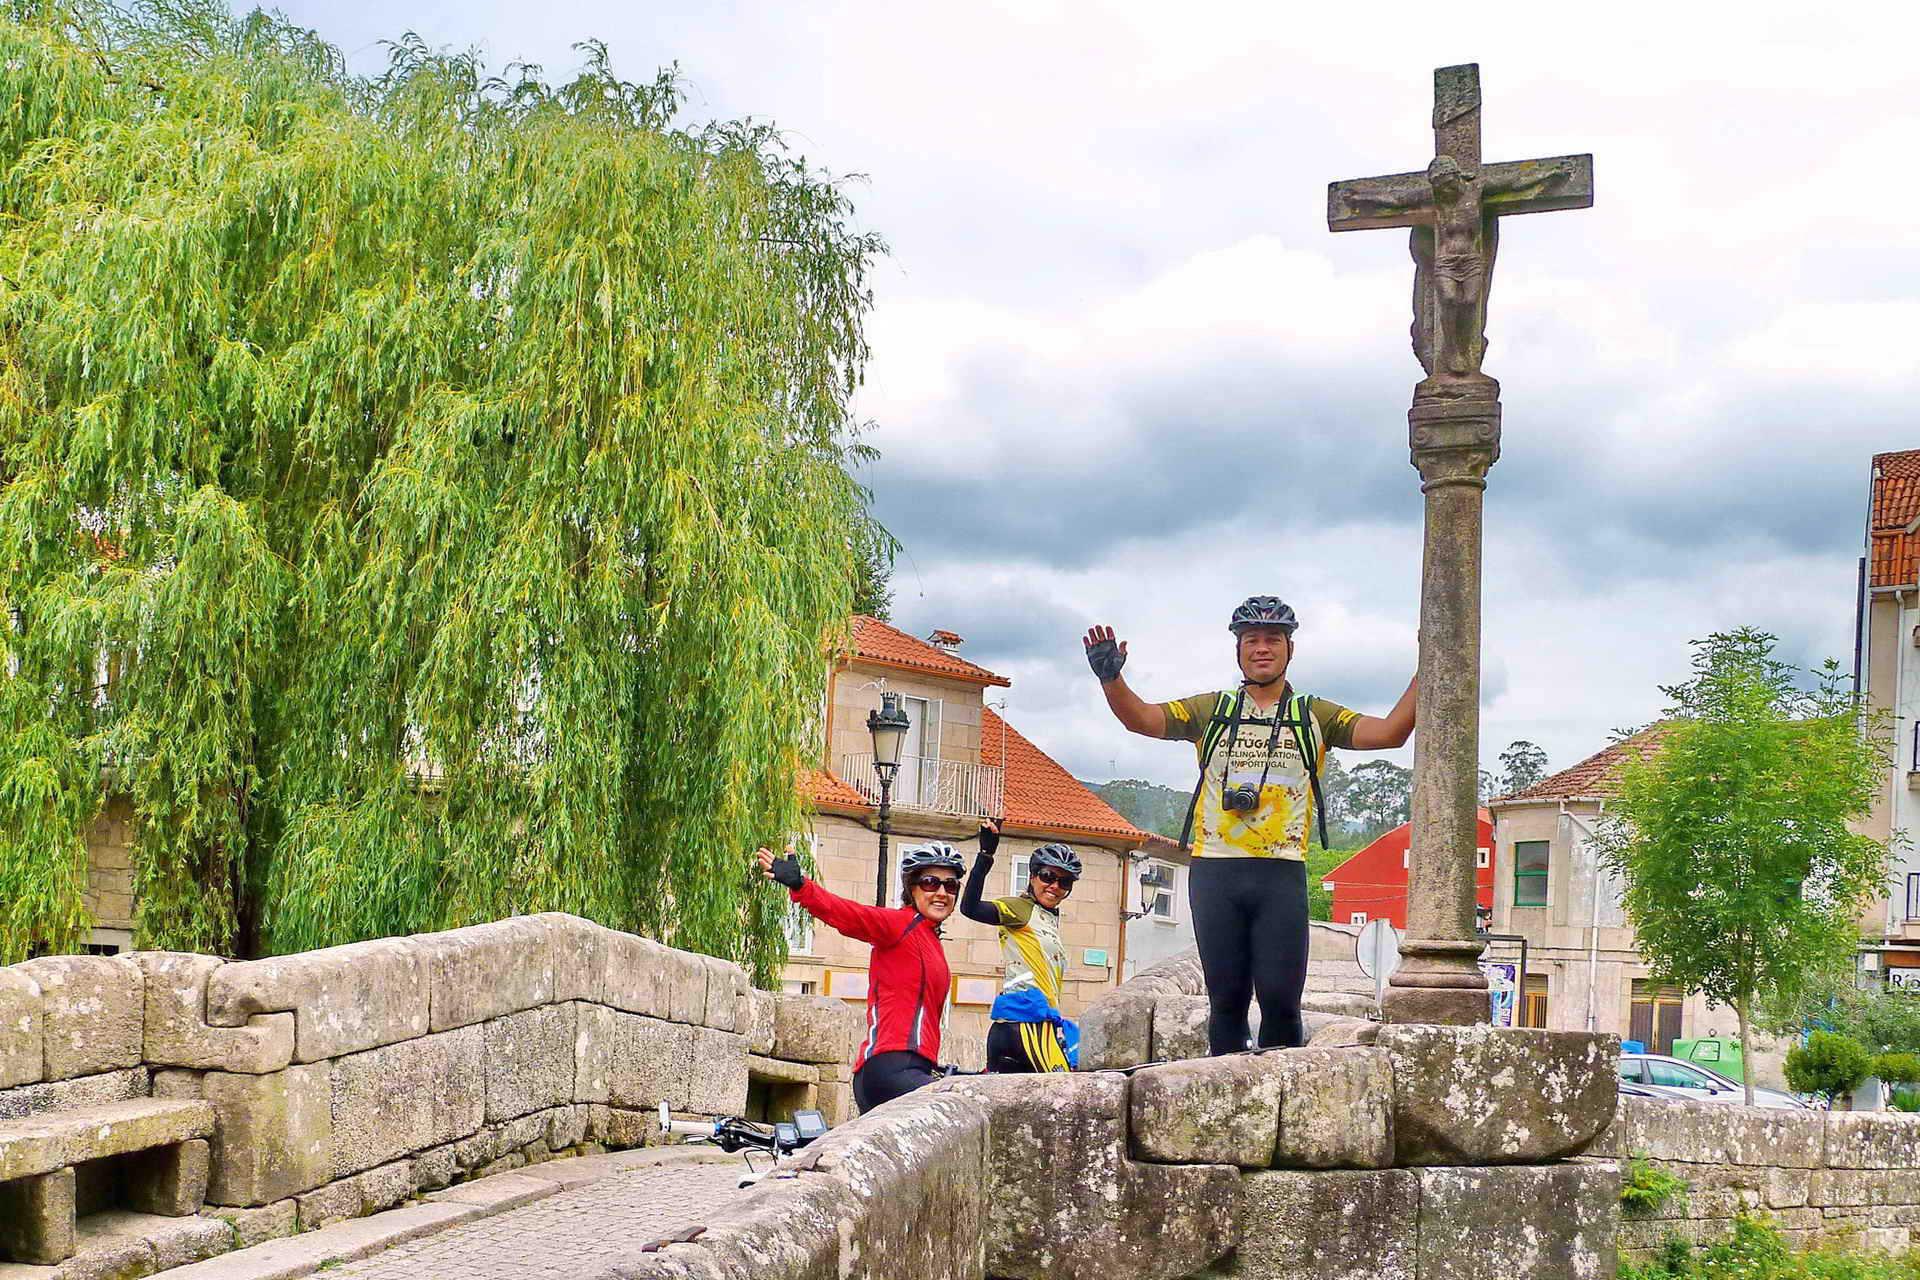 Cycling the Camino de Santiago, ancient roman bridgeCycling the Camino de Santiago, ancient roman bridge